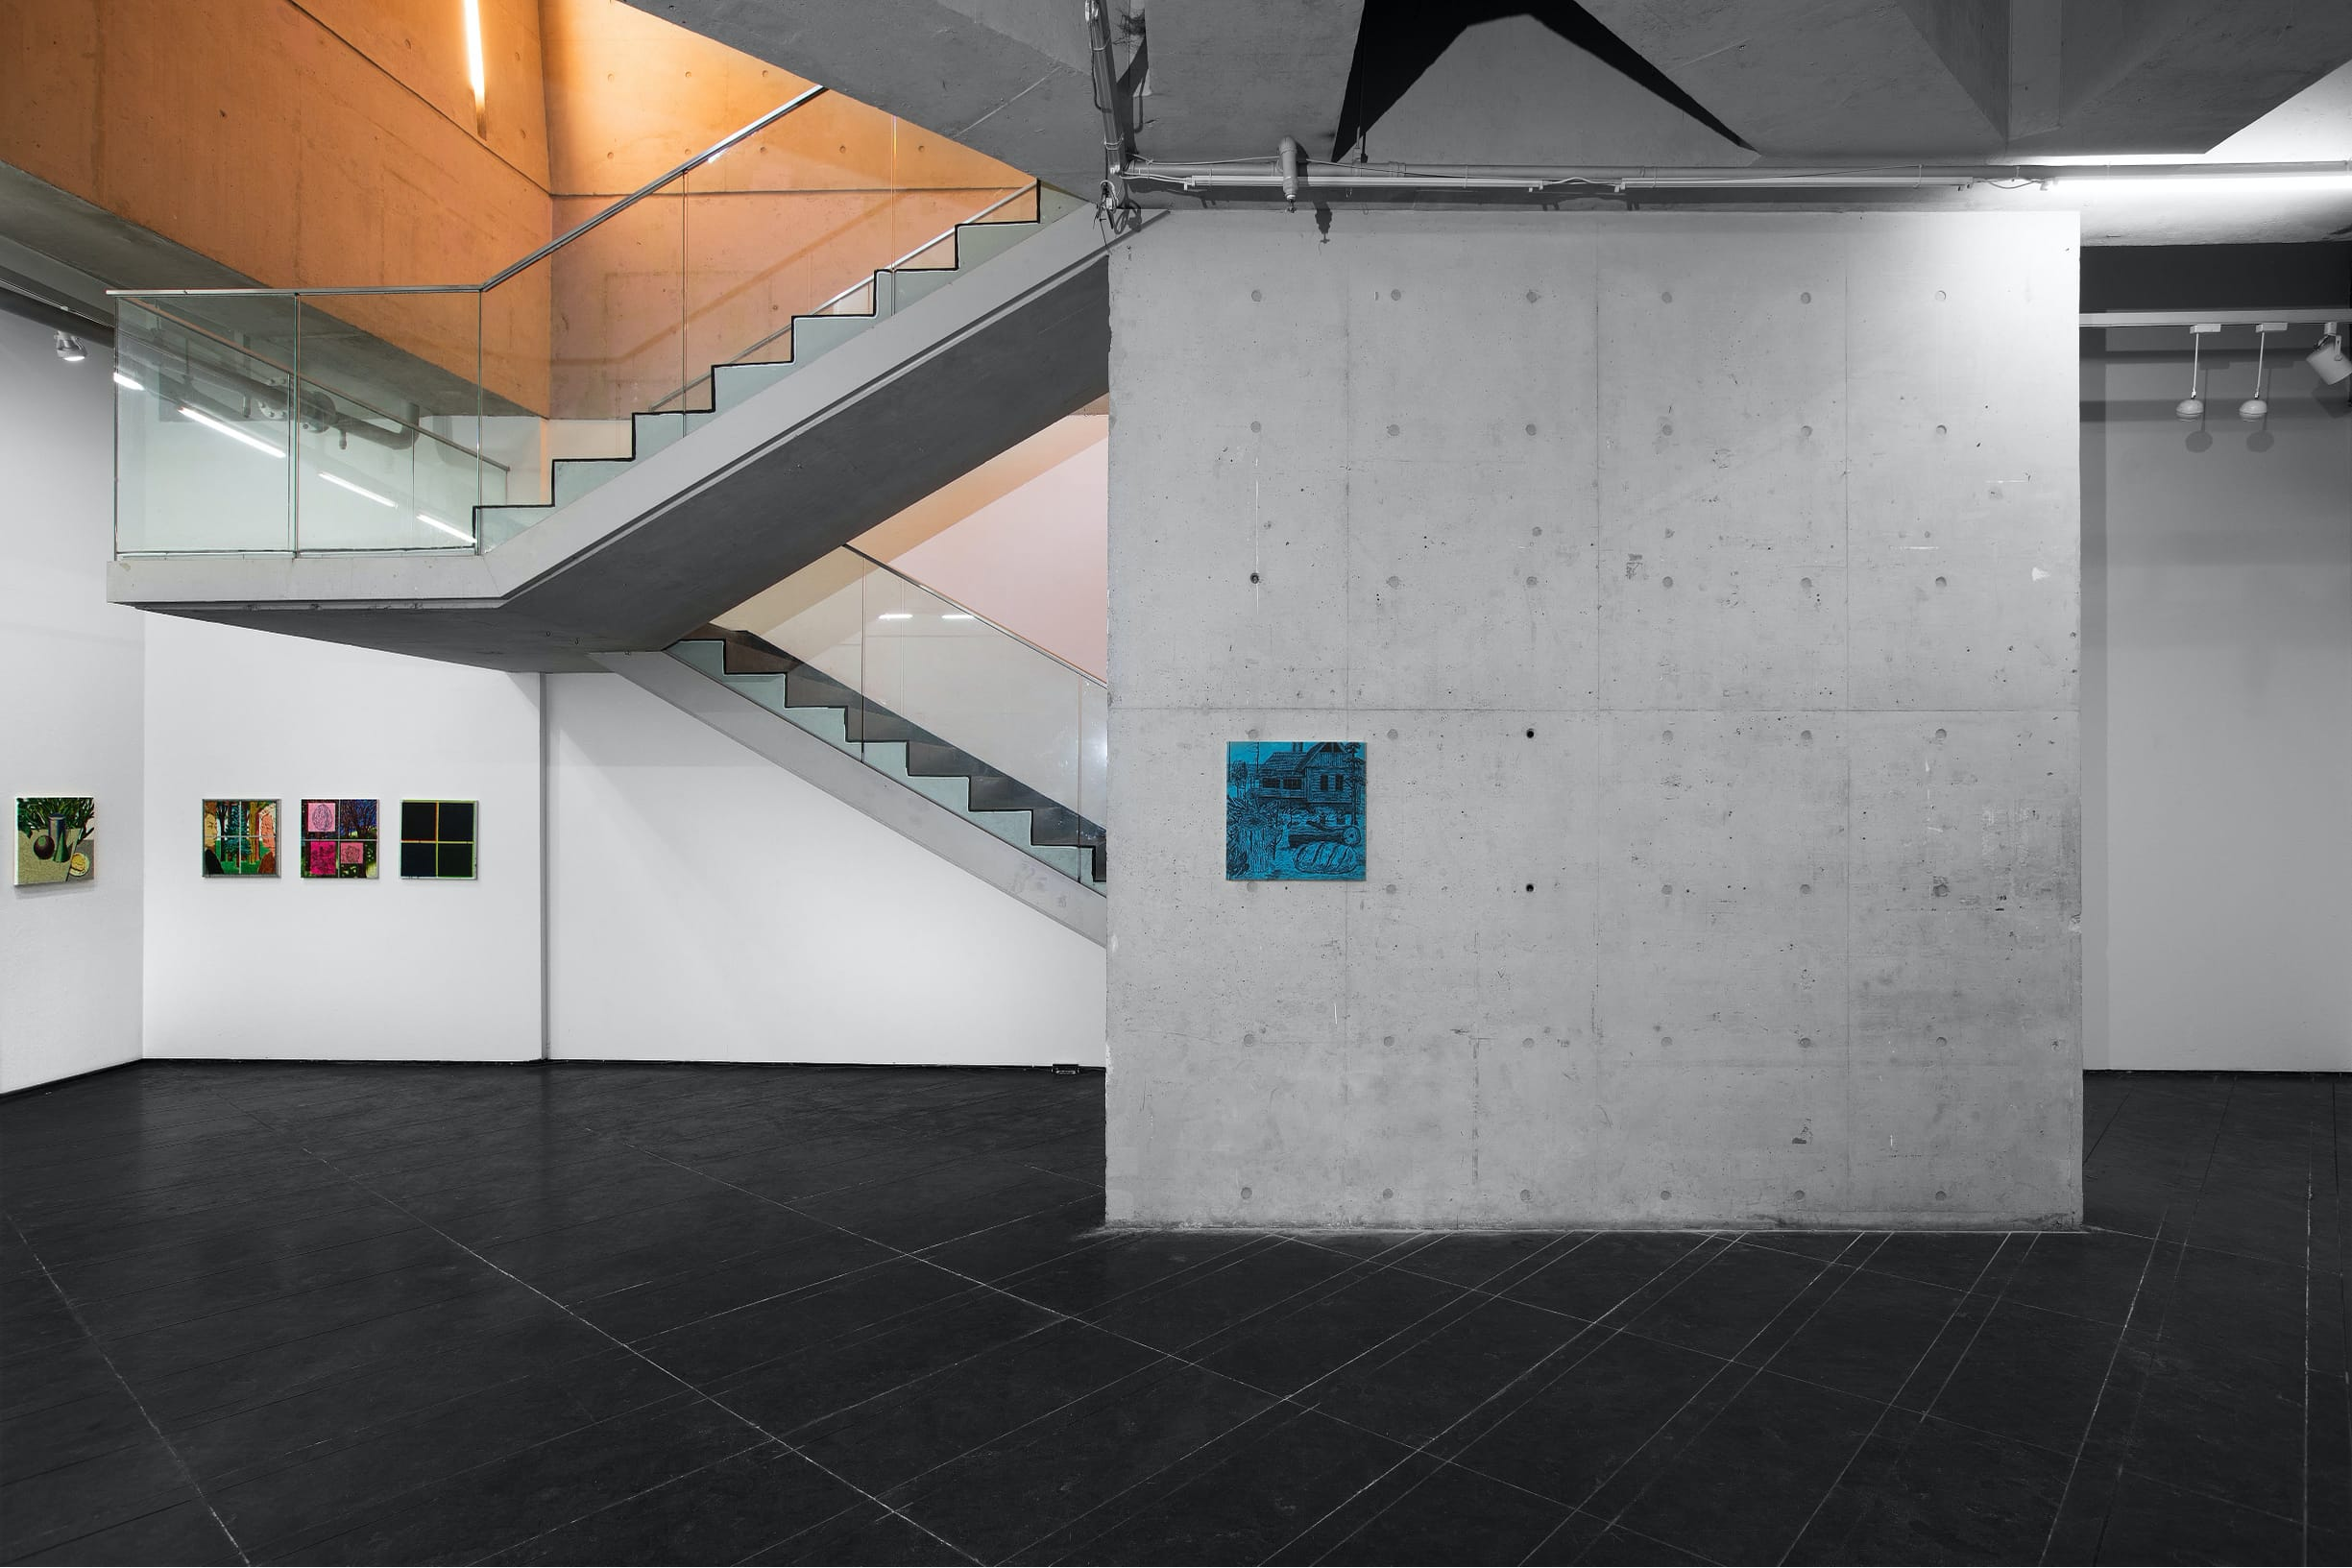 Hyun Sun Jeon Solo Exhibition: Parallel Paths